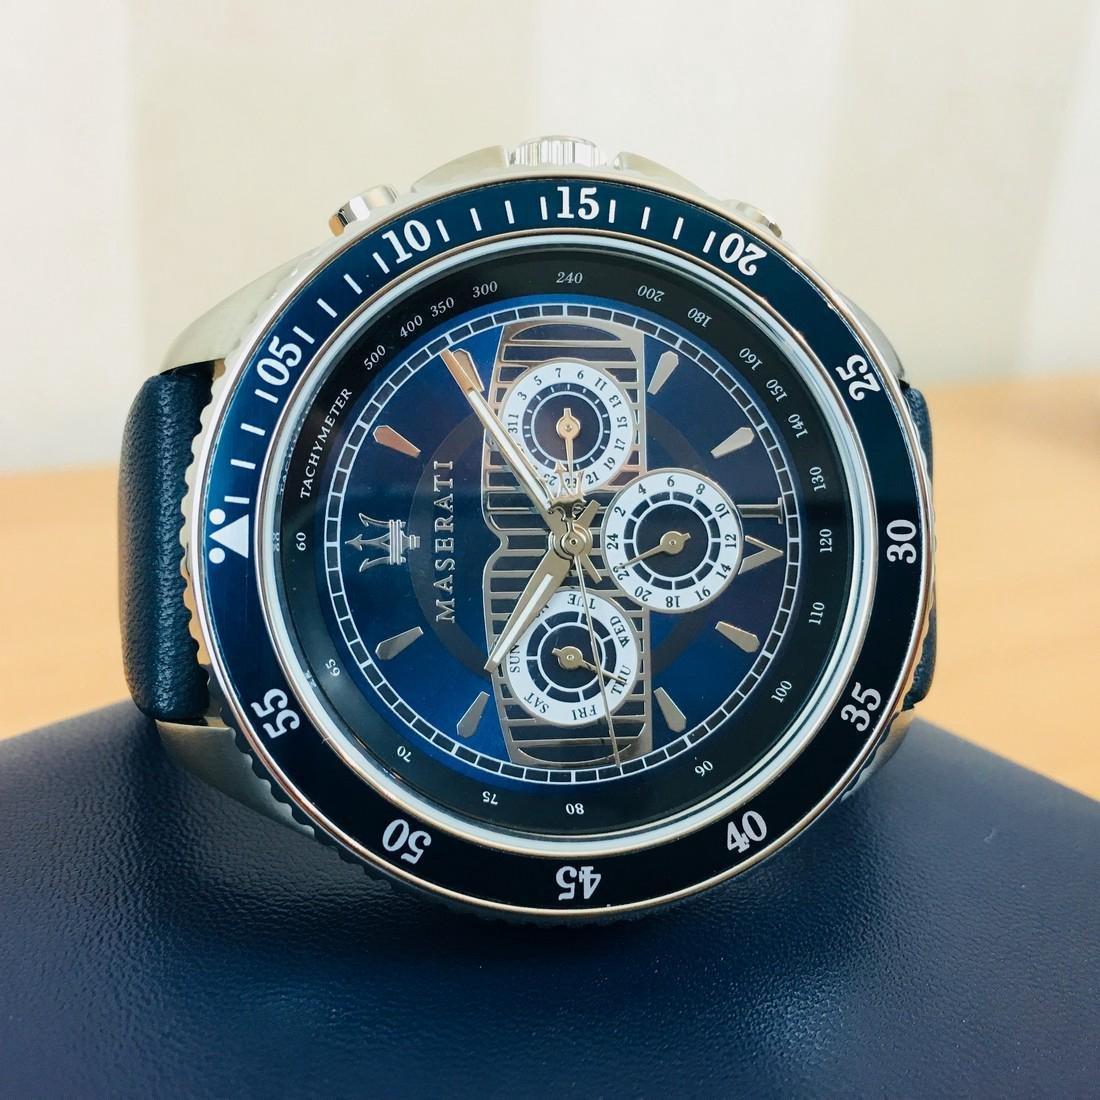 MASERATI – Men's Quartz Chronograph Watch - 5